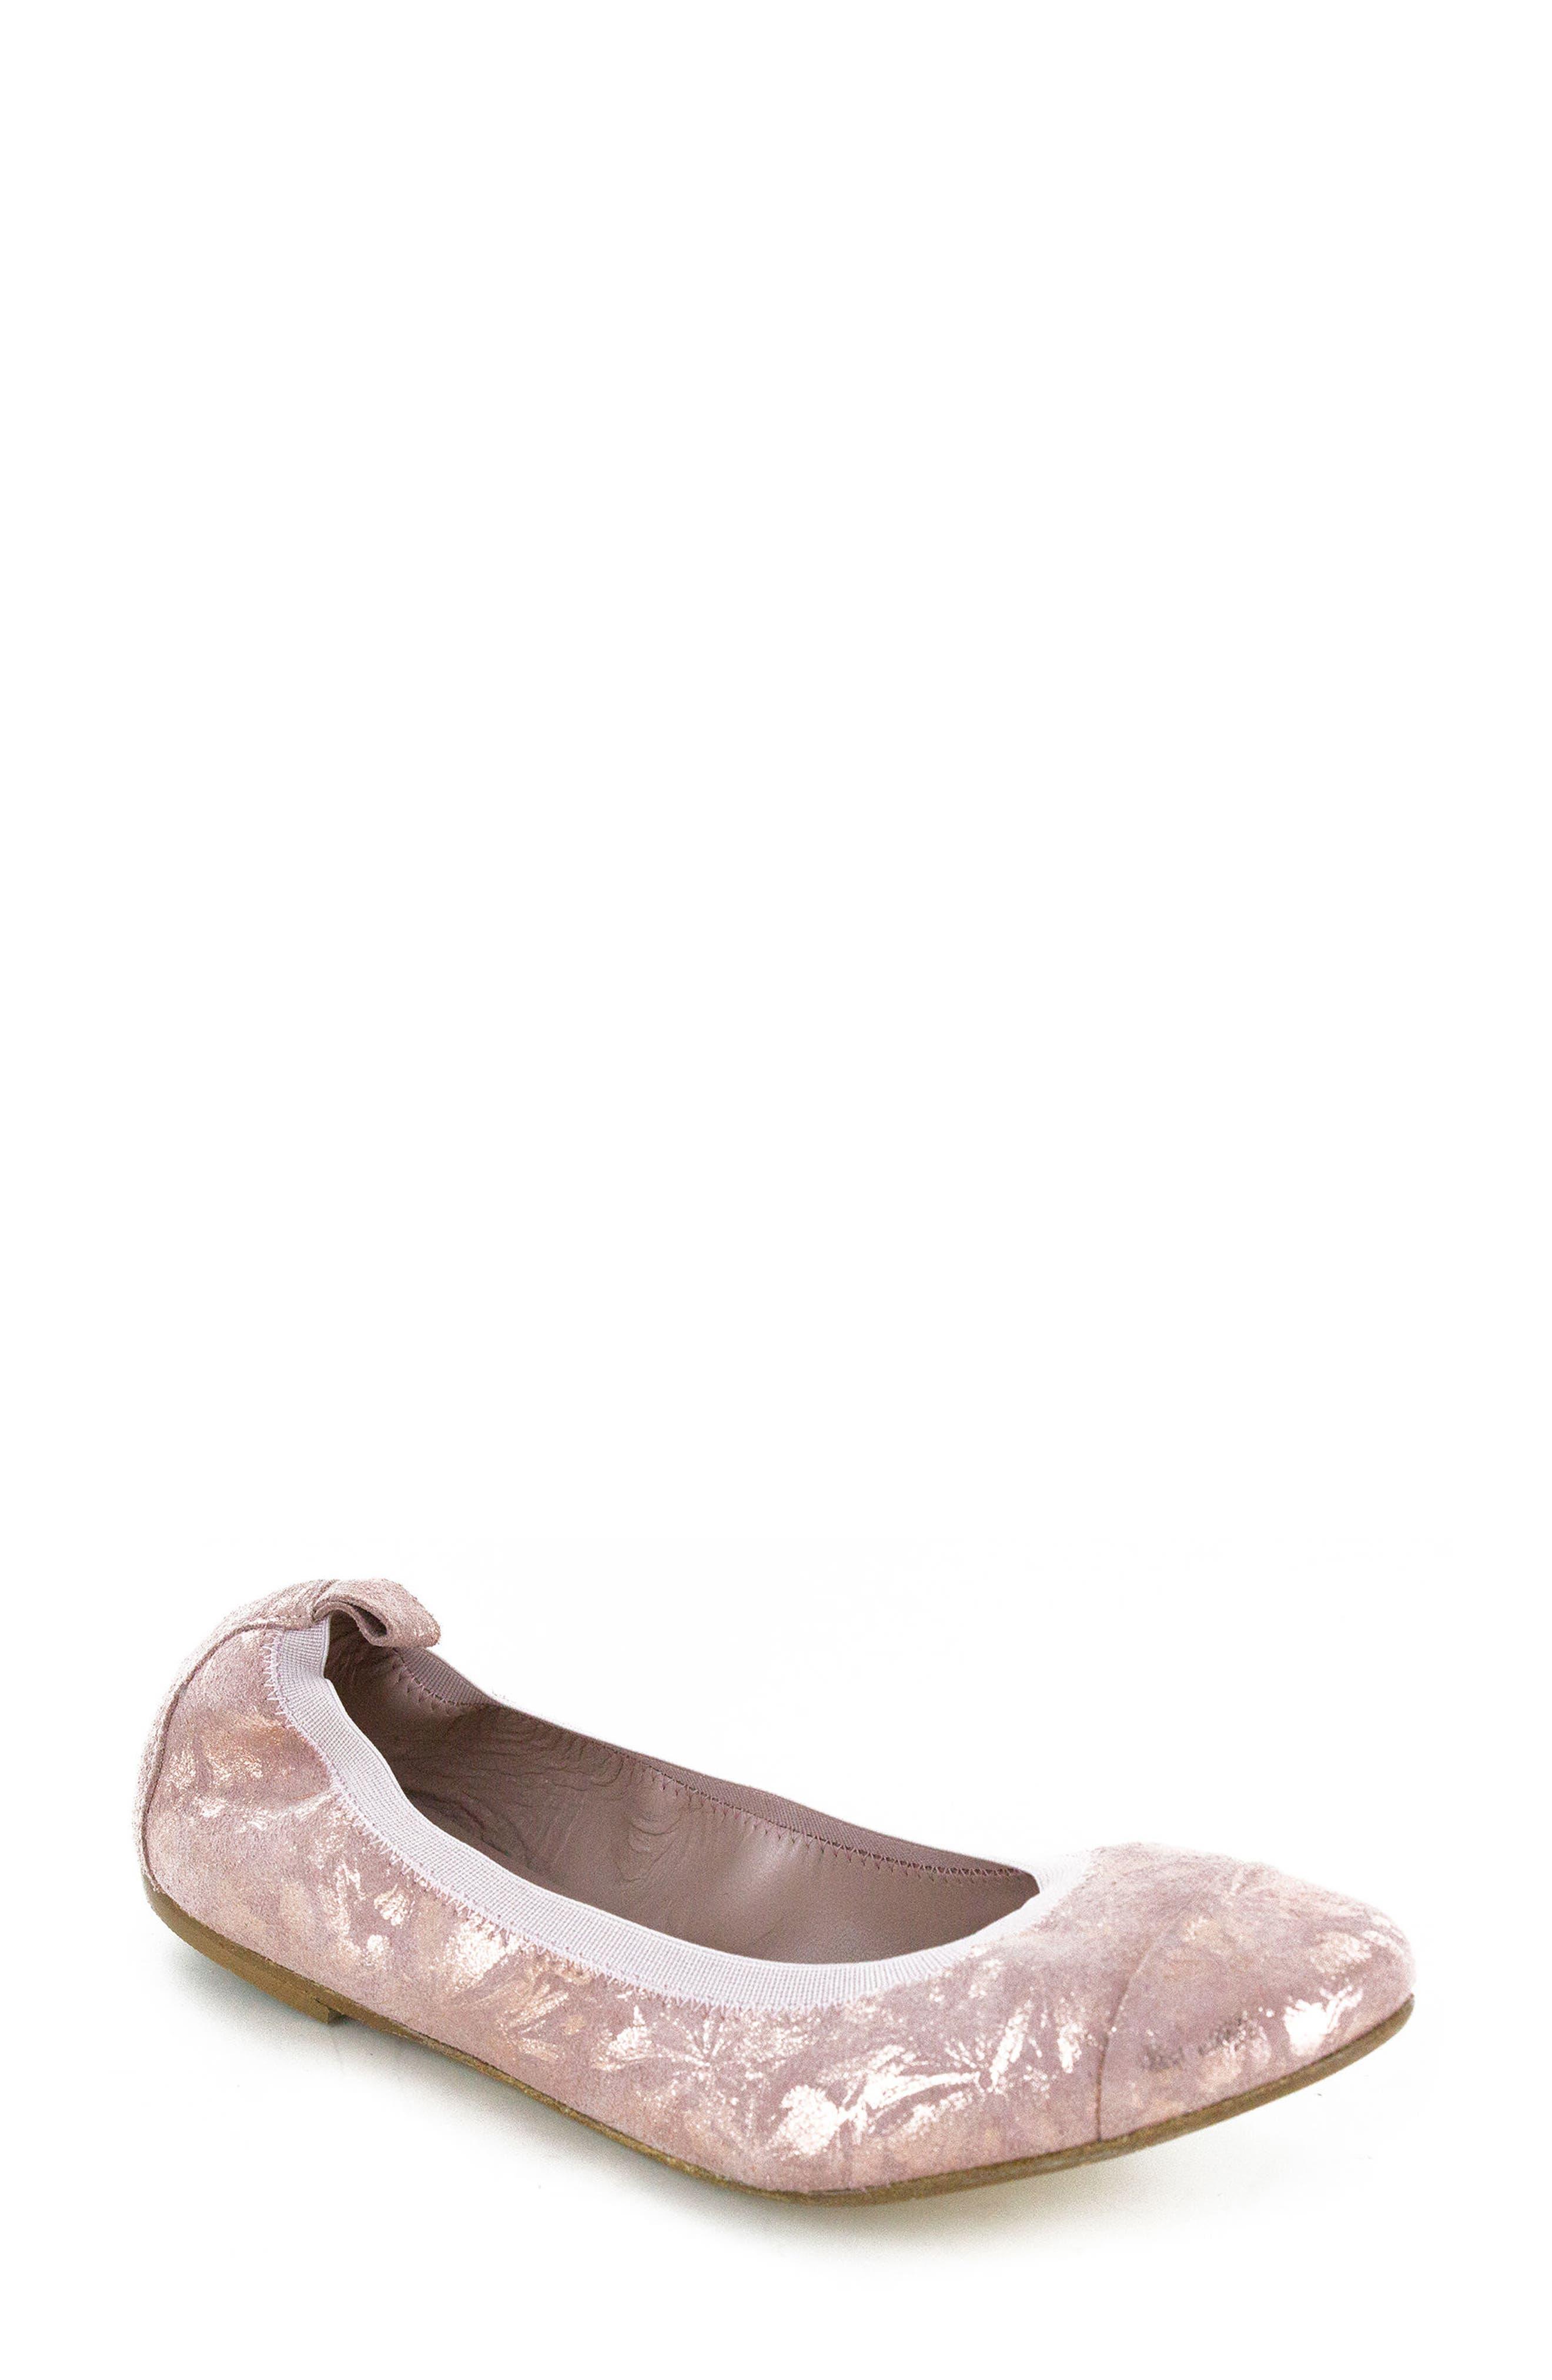 Kara Ballet Flat,                             Main thumbnail 1, color,                             Rose Quartz Floral Leather